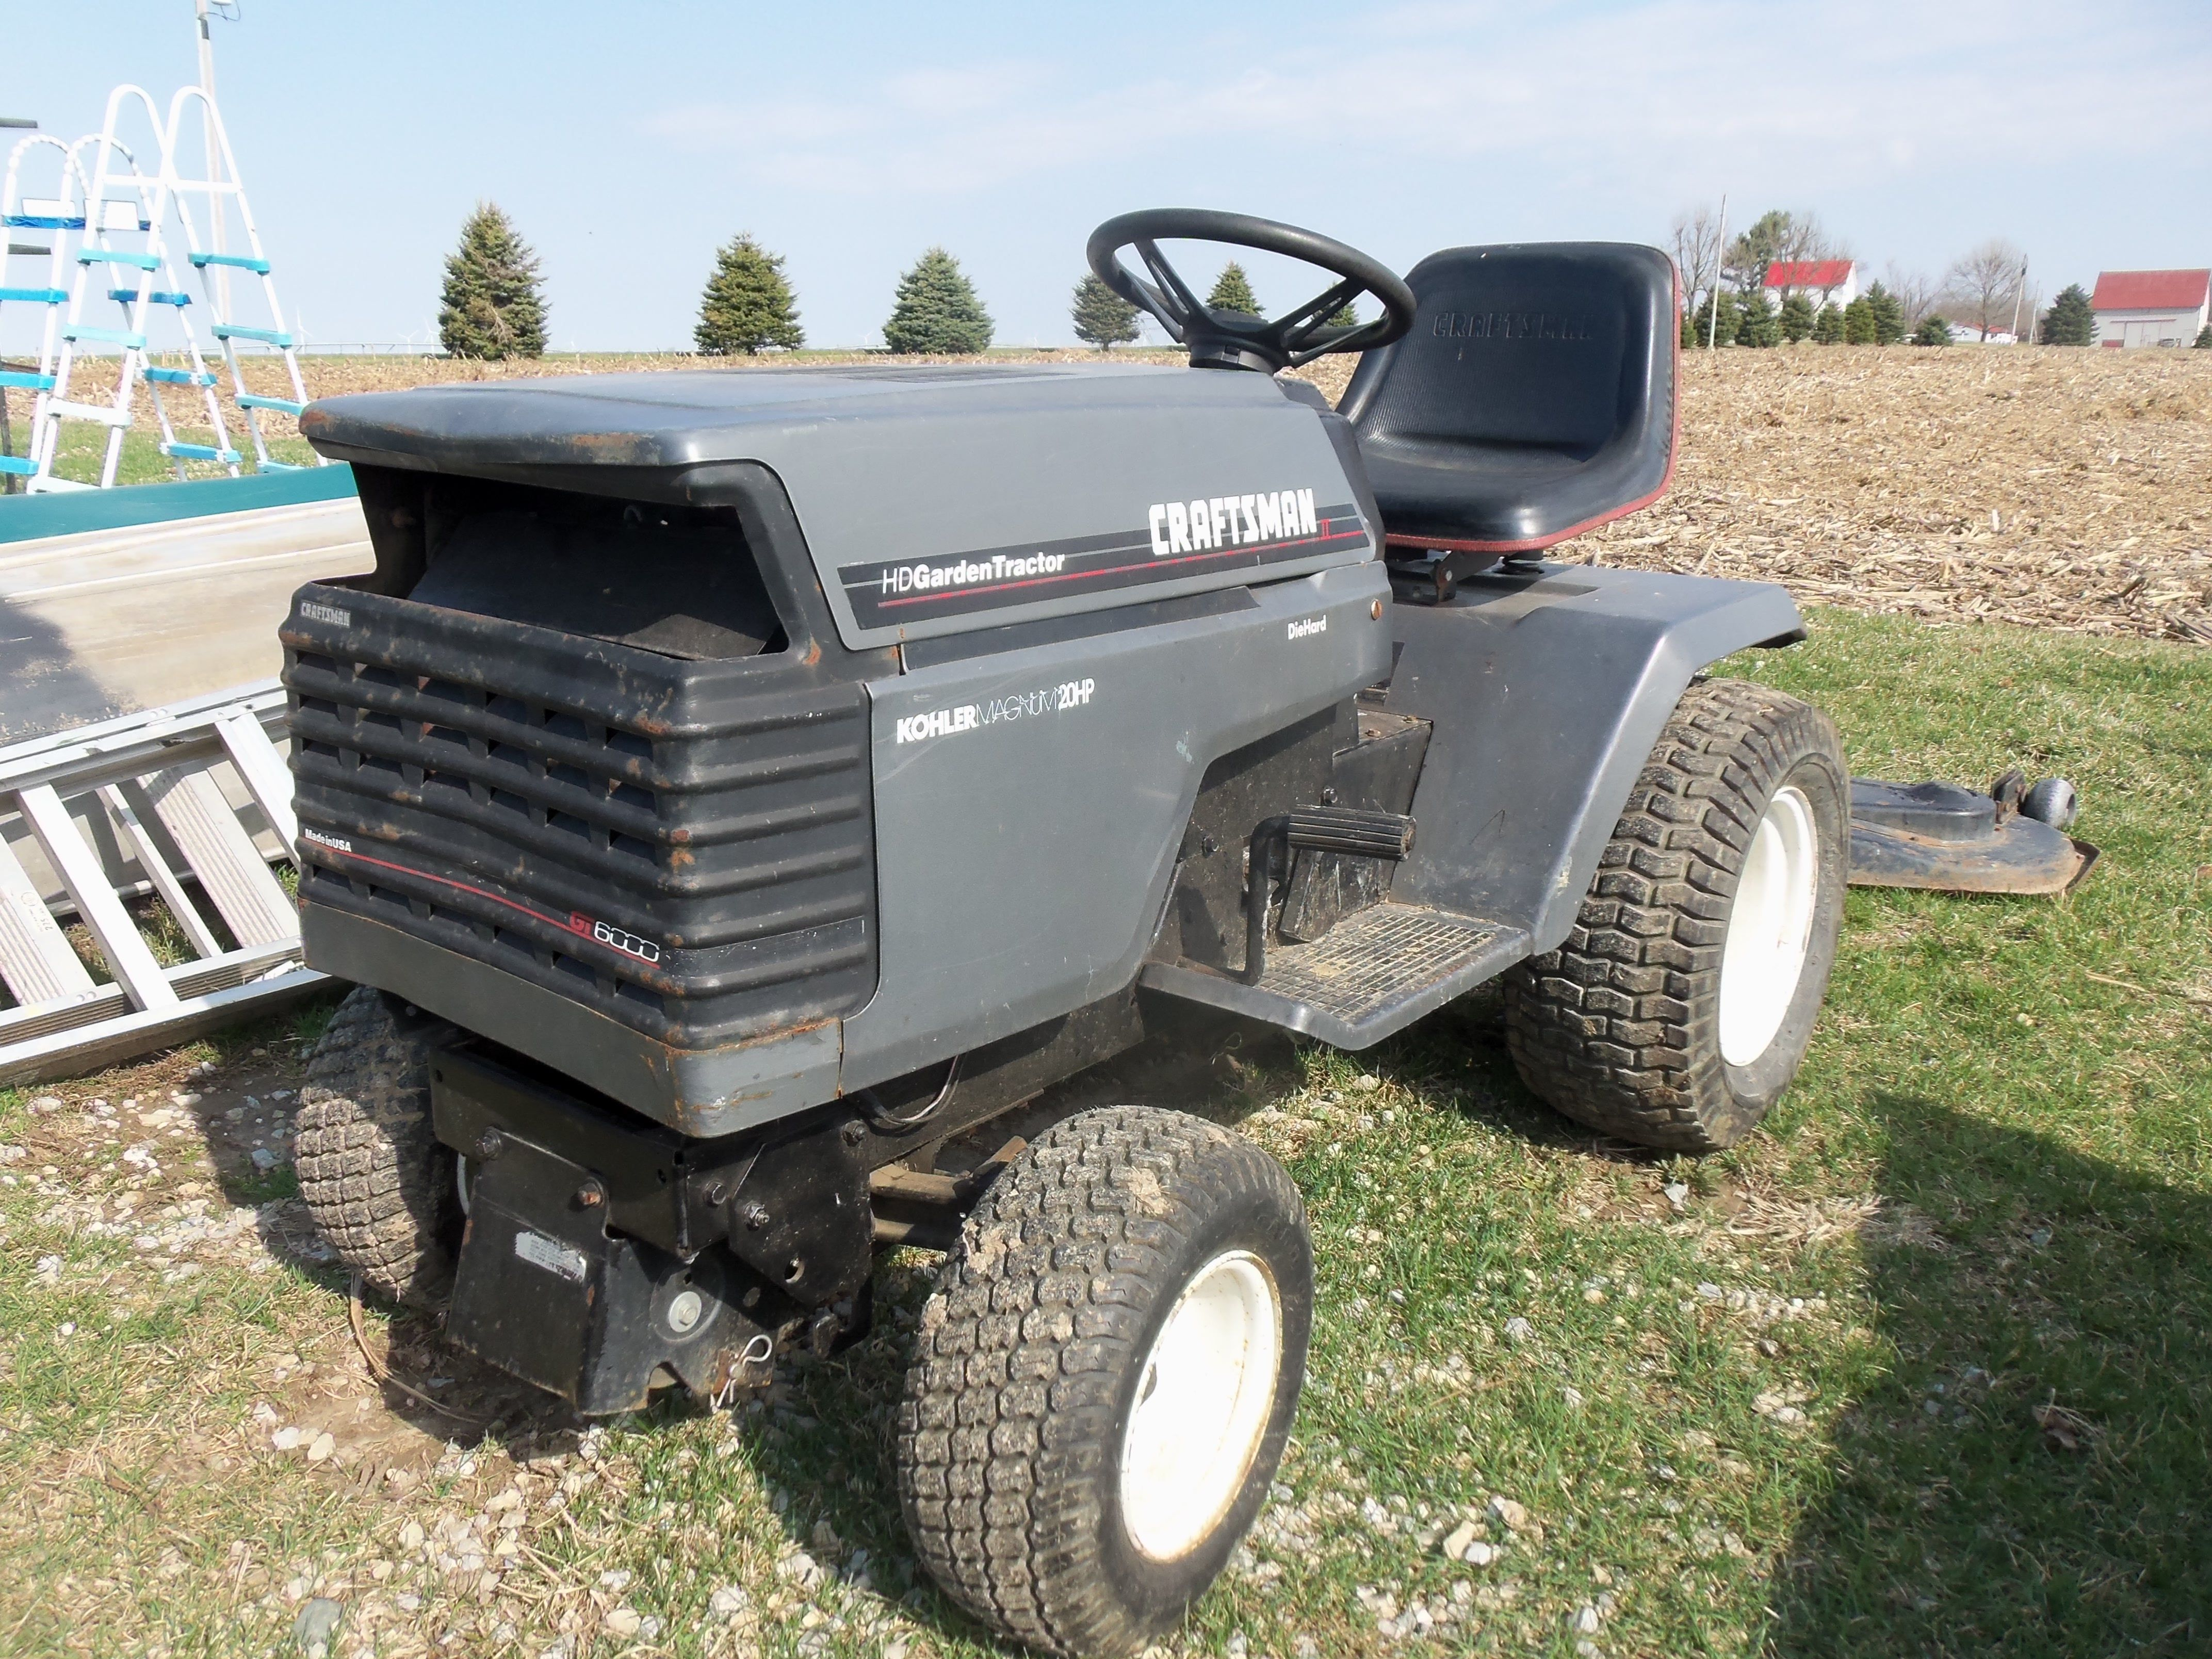 A gray Craftsman HD 2 lawn & garden tractor